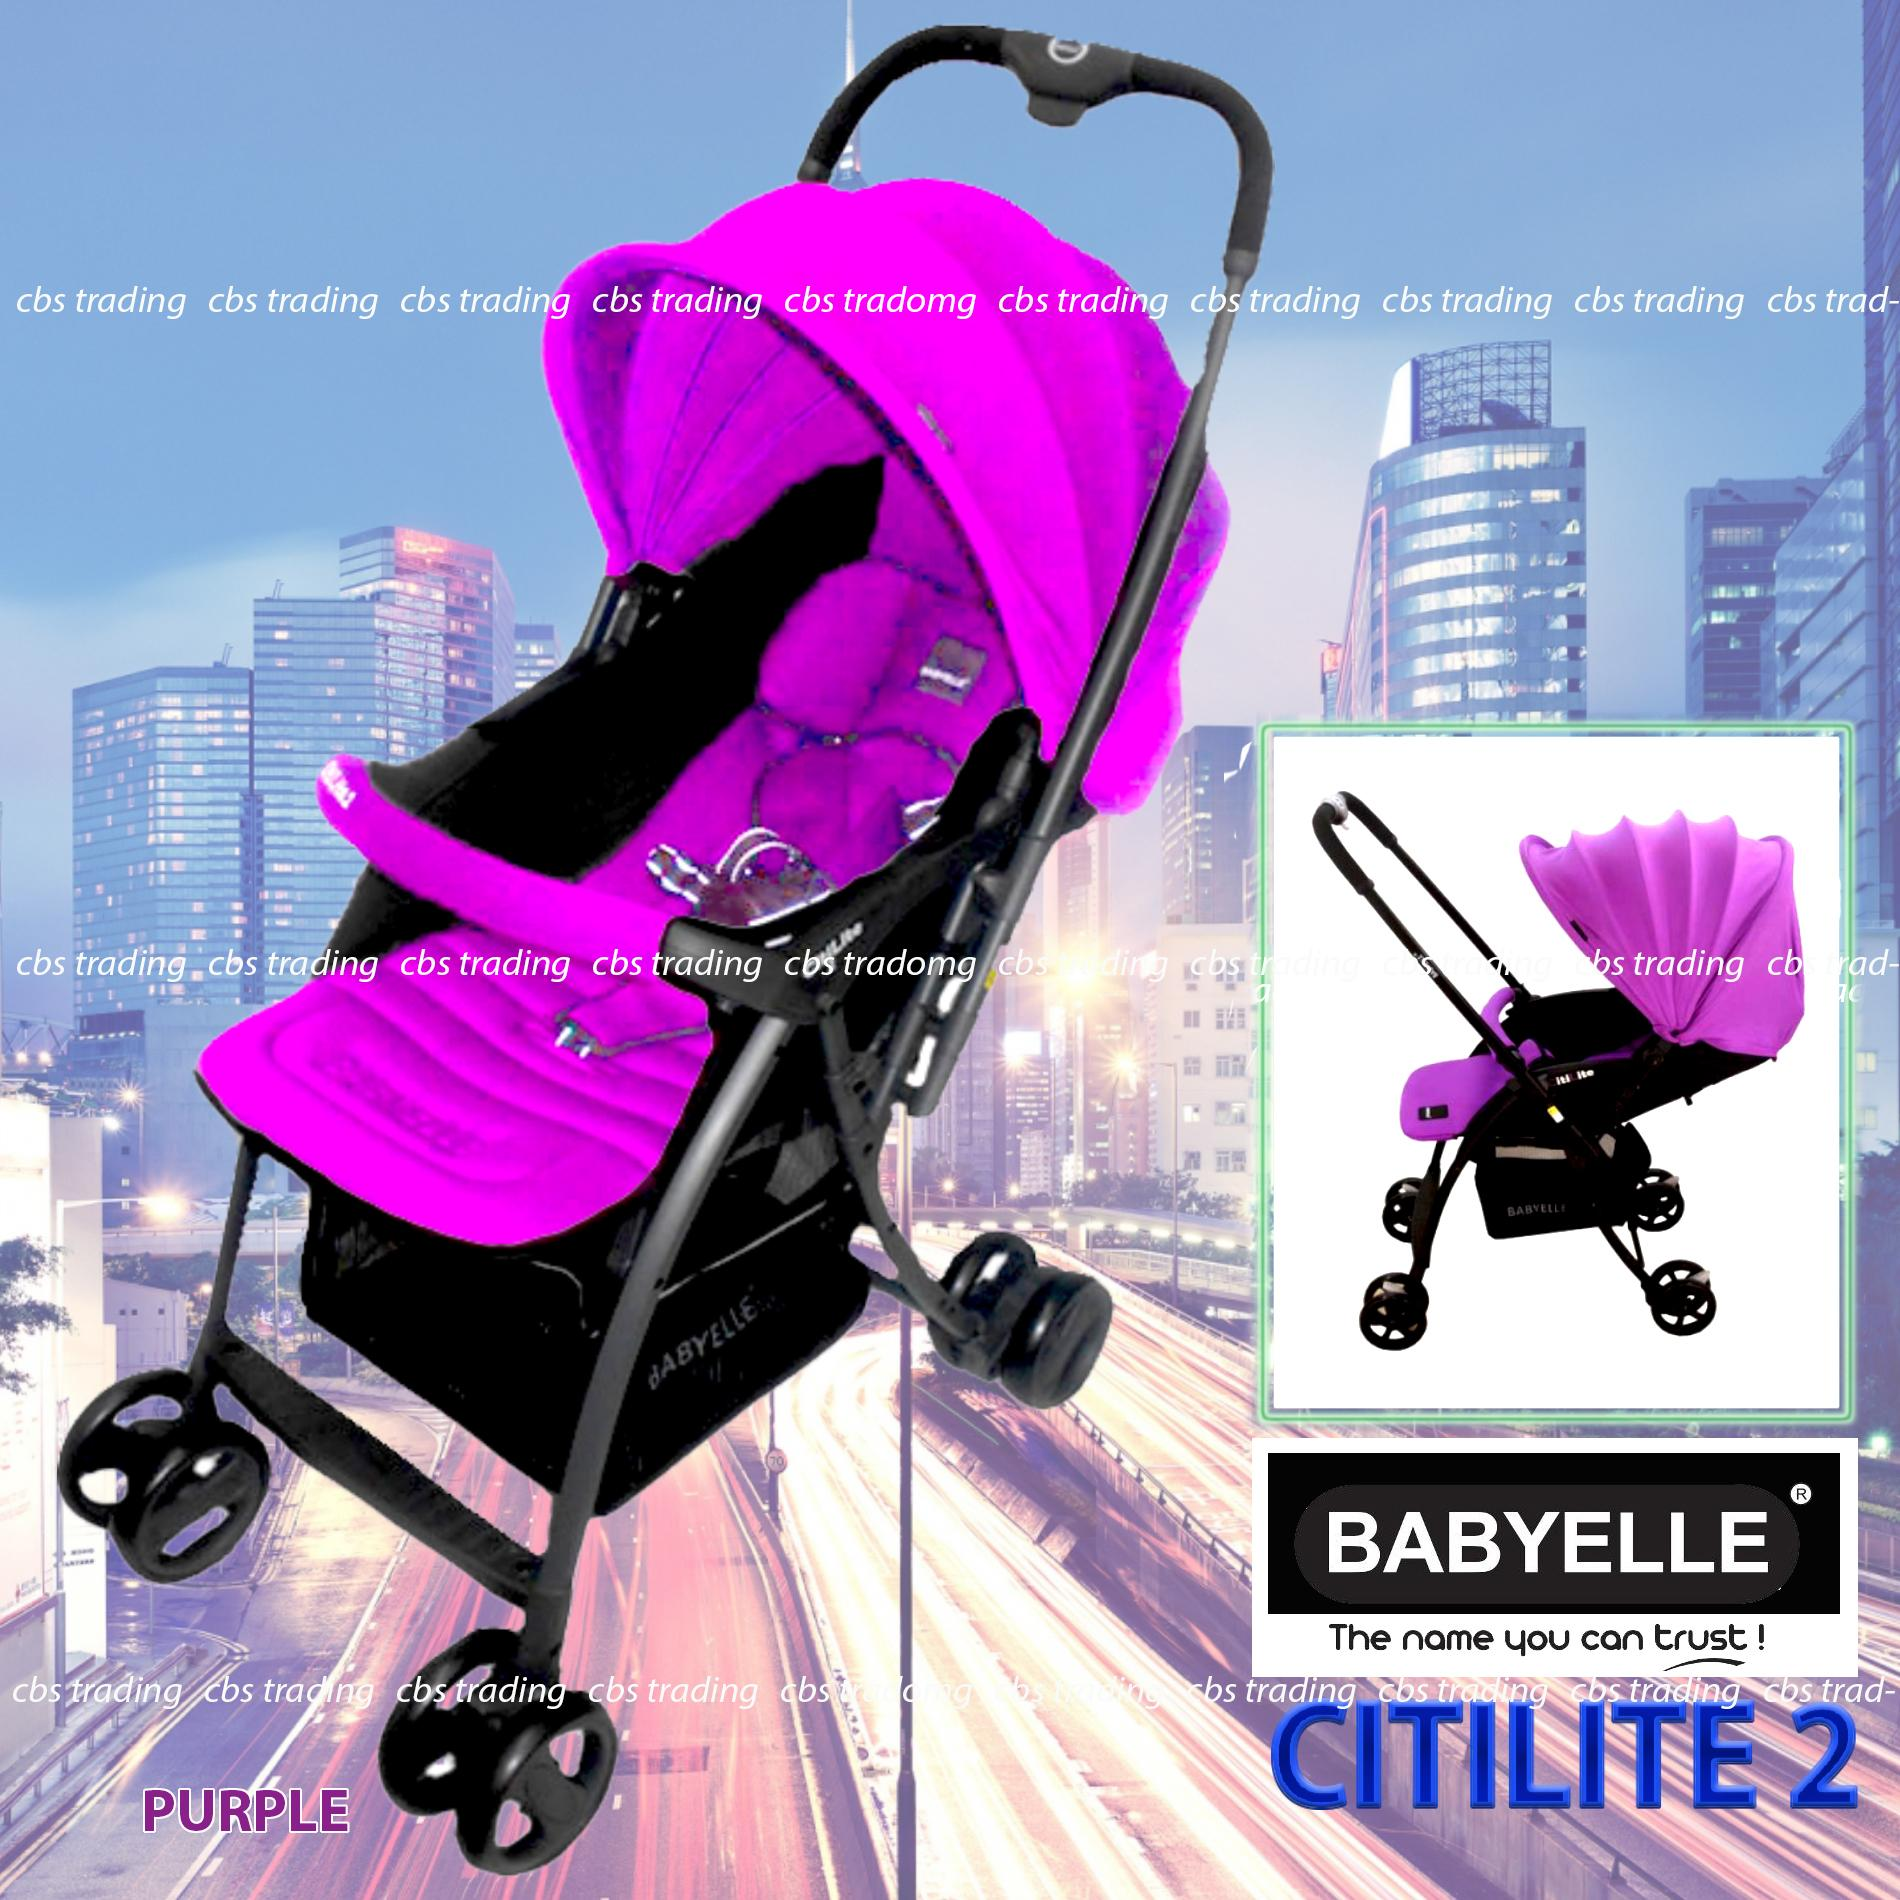 Seebaby Stroller Qq1 Cat Hijau A Big Deal Q5 Titi Kamal Pilihanku Cari Harga Pliko New Grande S 268 With 4 In 1 Features